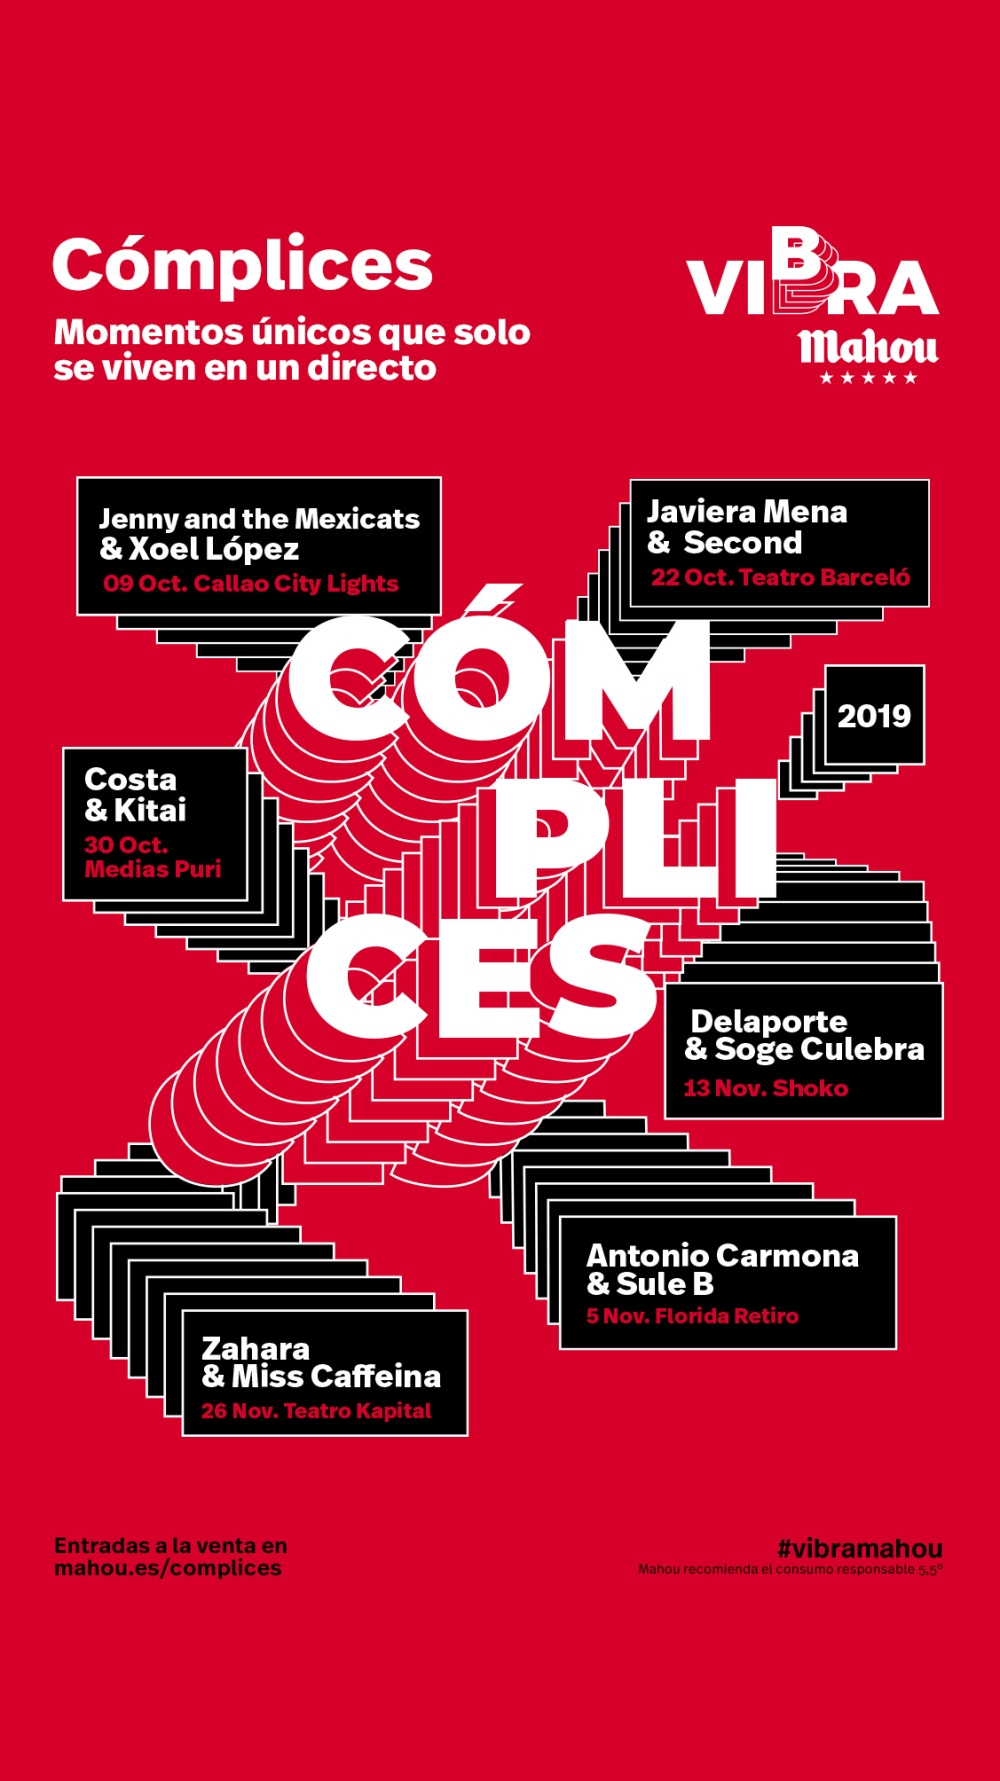 CARTEL CÓMPLICES DE VIBRA MAHOU 2019.jpg